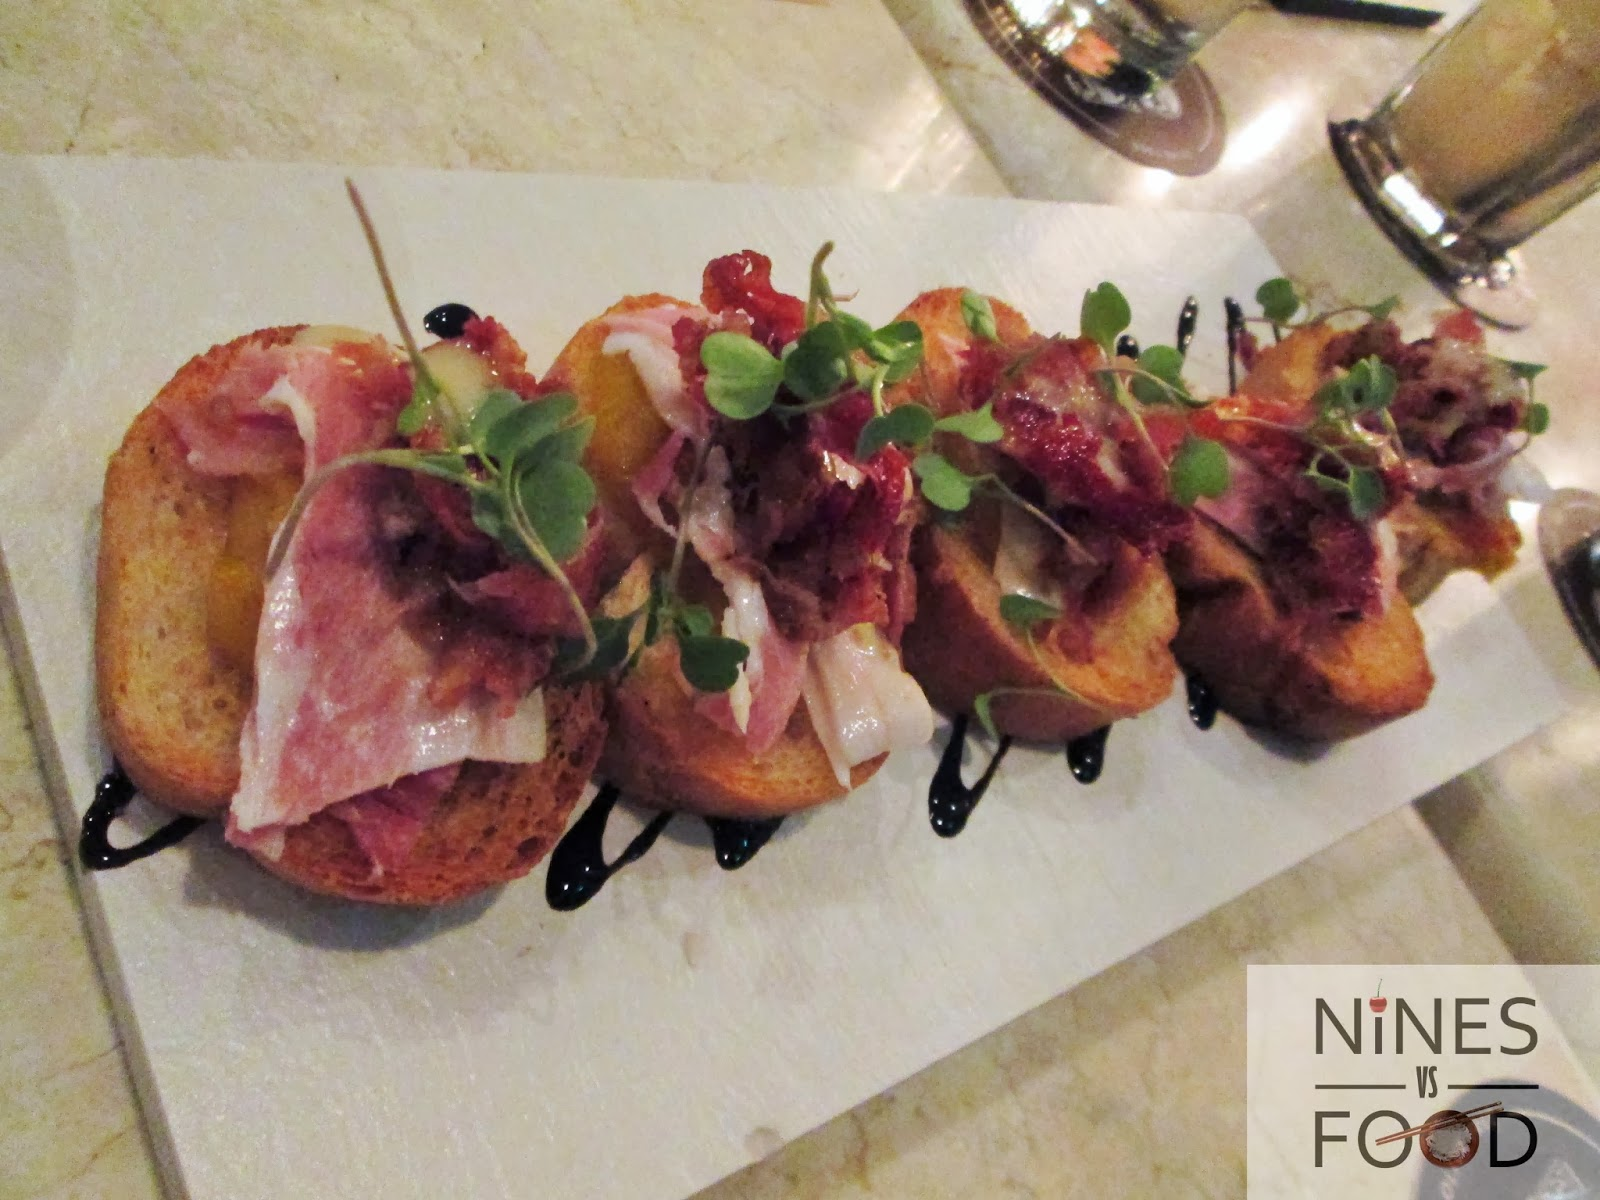 Nines vs. Food - Olive Tree Kitchen and Bar-13.jpg